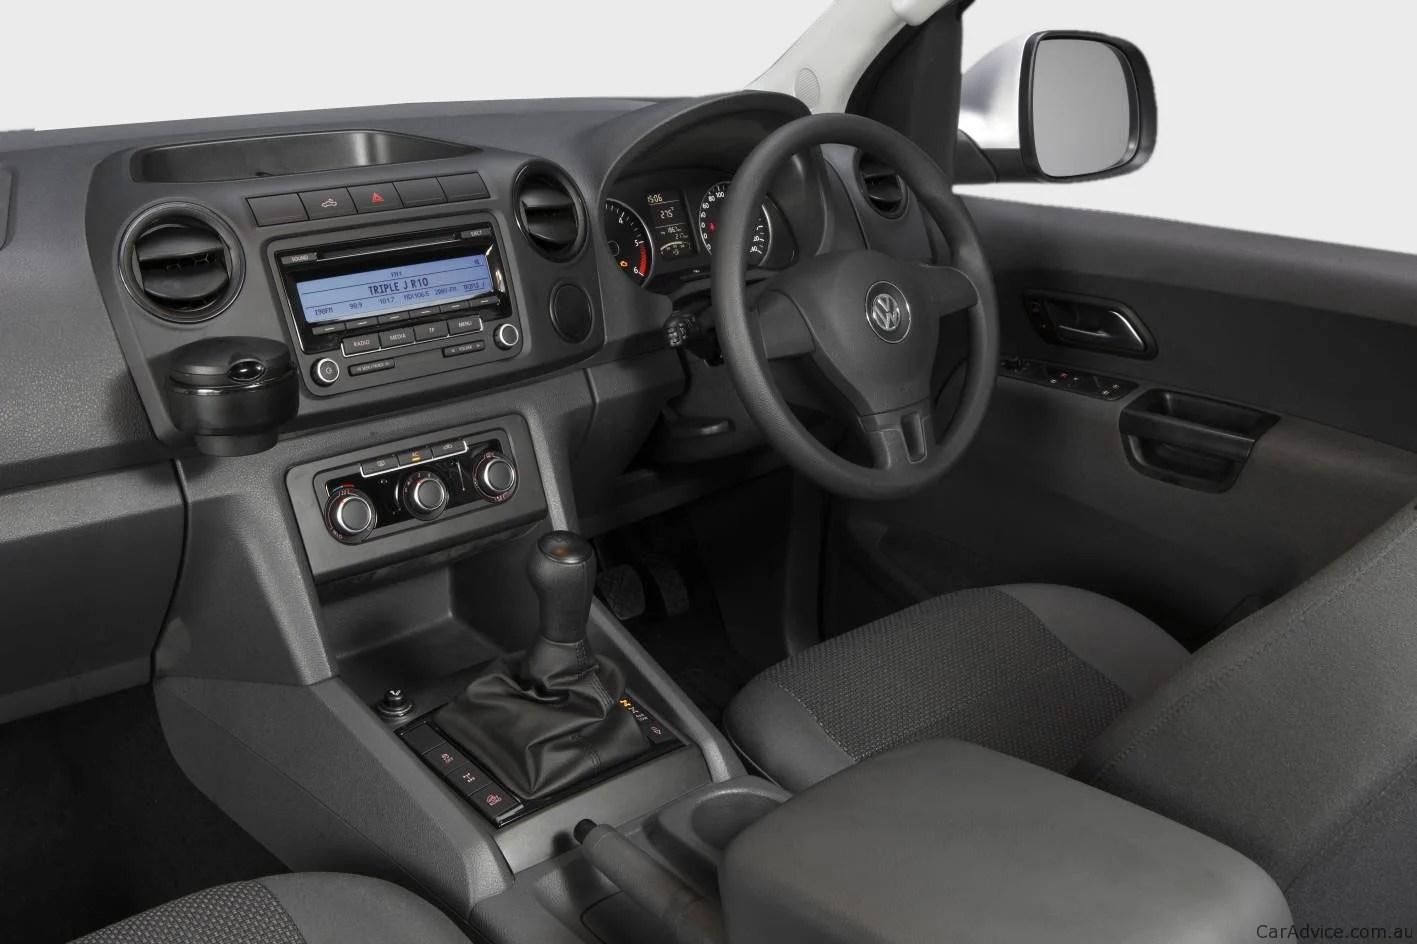 Volkswagen Amarok Off Road Review Photos CarAdvice